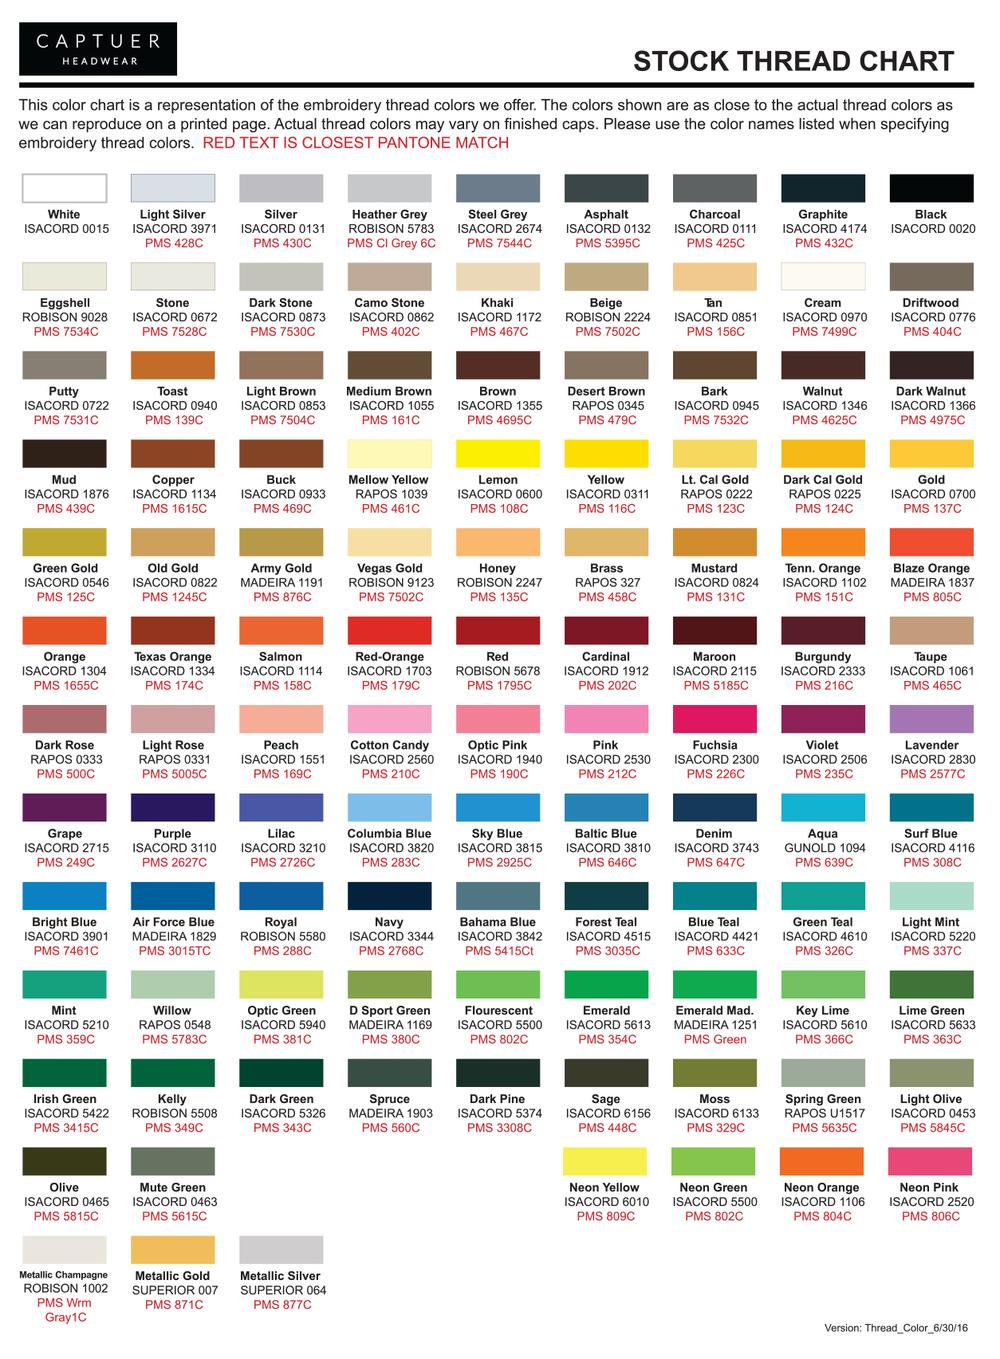 Thread chart captuer headwear download captuer thread chart illustrator pdf nvjuhfo Images